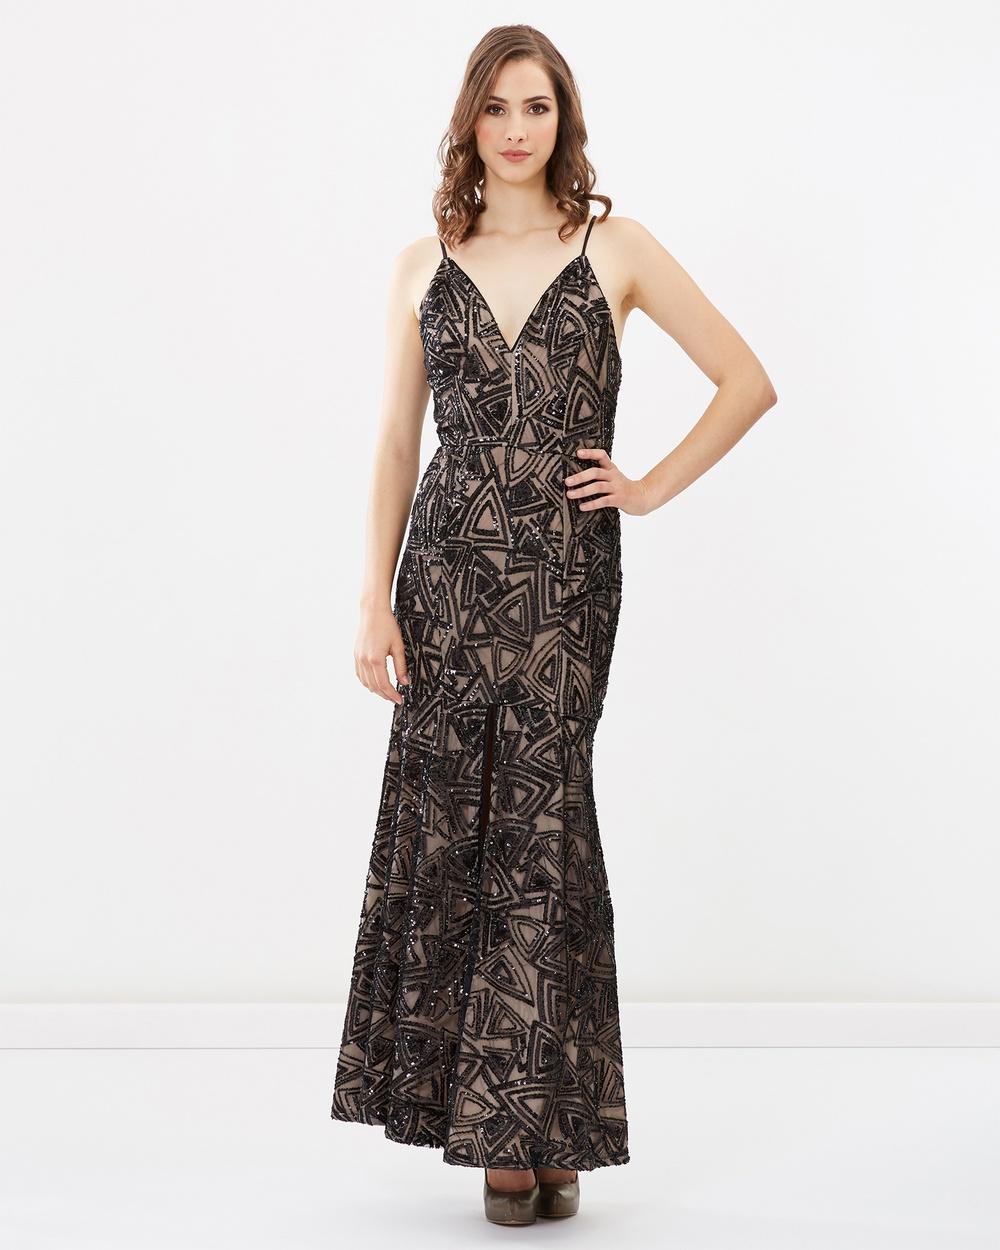 Romance by Honey and Beau Alyssa Sequin Maxi Dress Bridesmaid Dresses Black-Nude Alyssa Sequin Maxi Dress